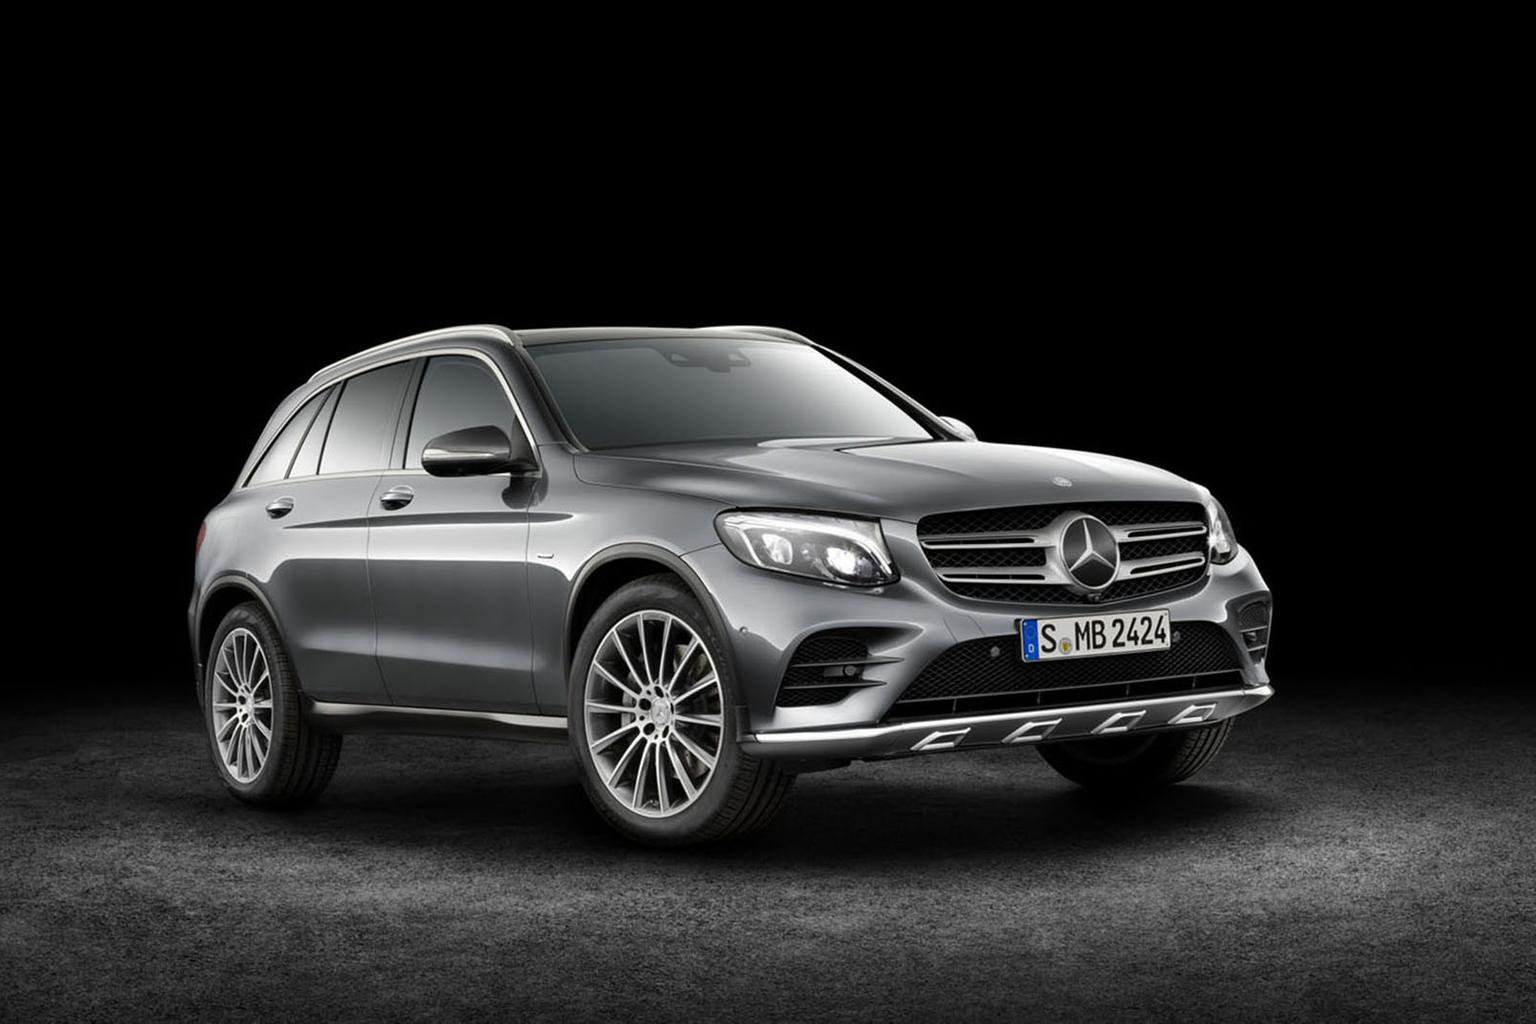 2015 Mercedes-Benz GLC revealed